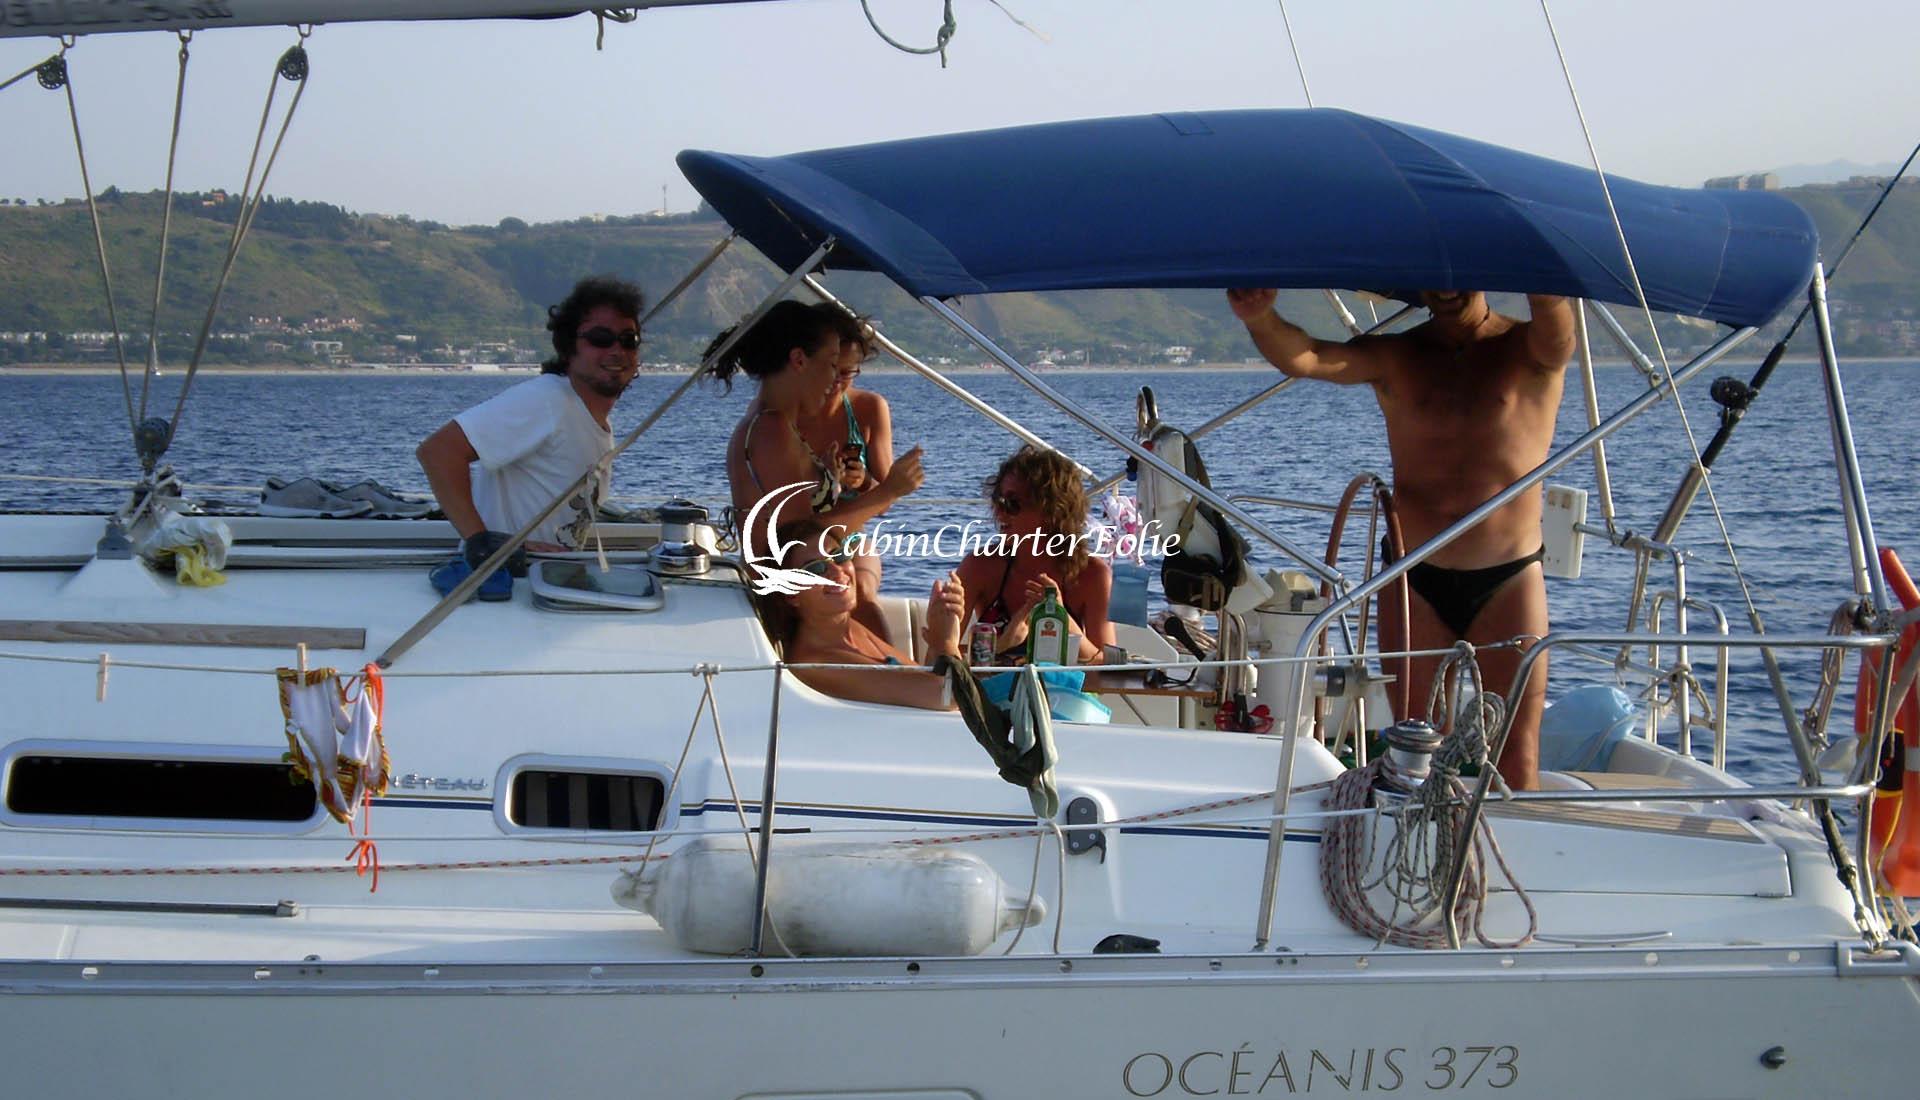 Alicudi - Imbarco Individuale - Barca a Vela - Vacanza - Cabin Charter Eolie